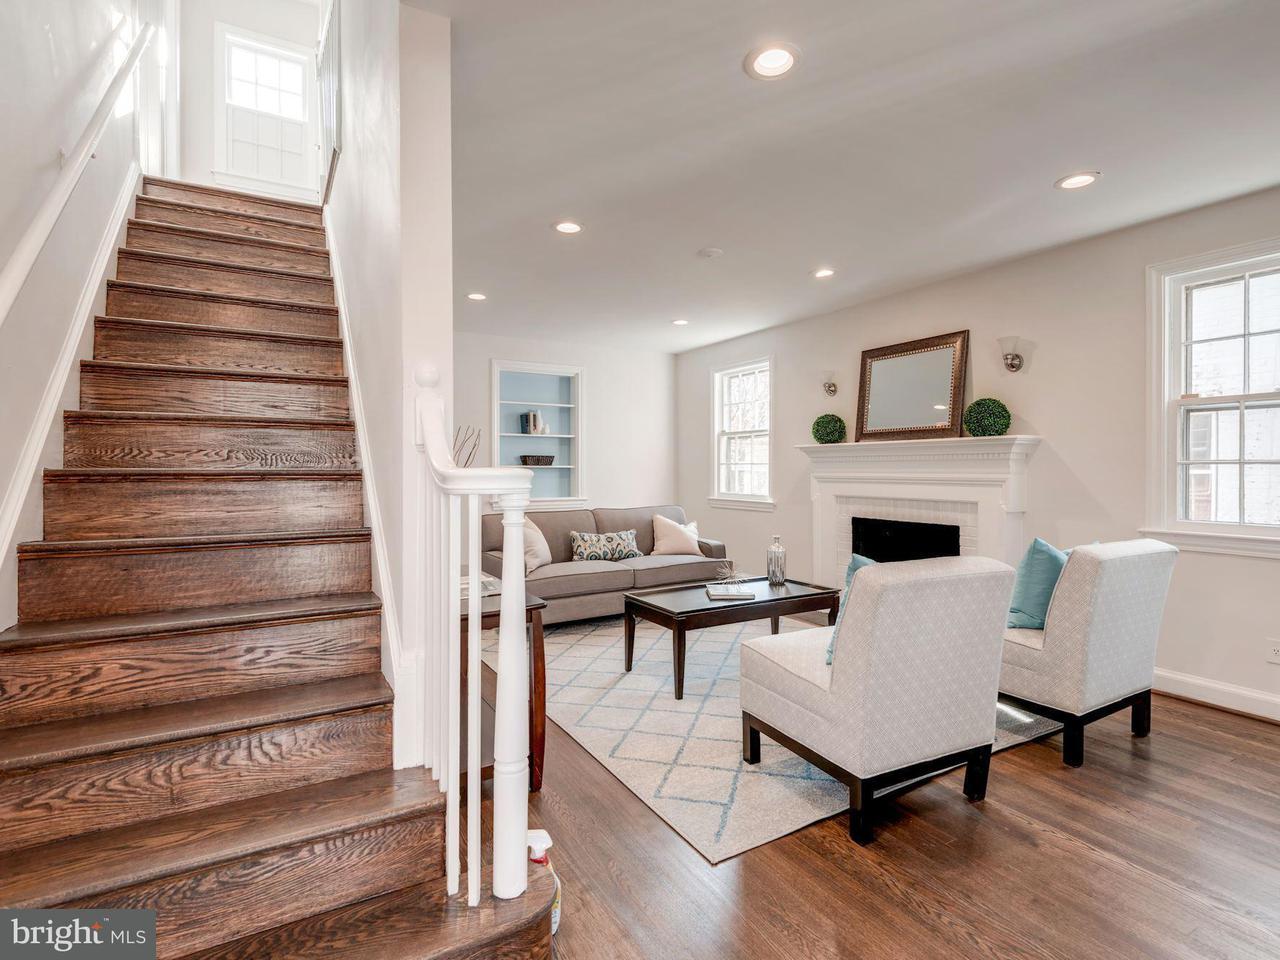 Single Family Home for Sale at 1364 VAN BUREN ST NW 1364 VAN BUREN ST NW Washington, District Of Columbia 20012 United States